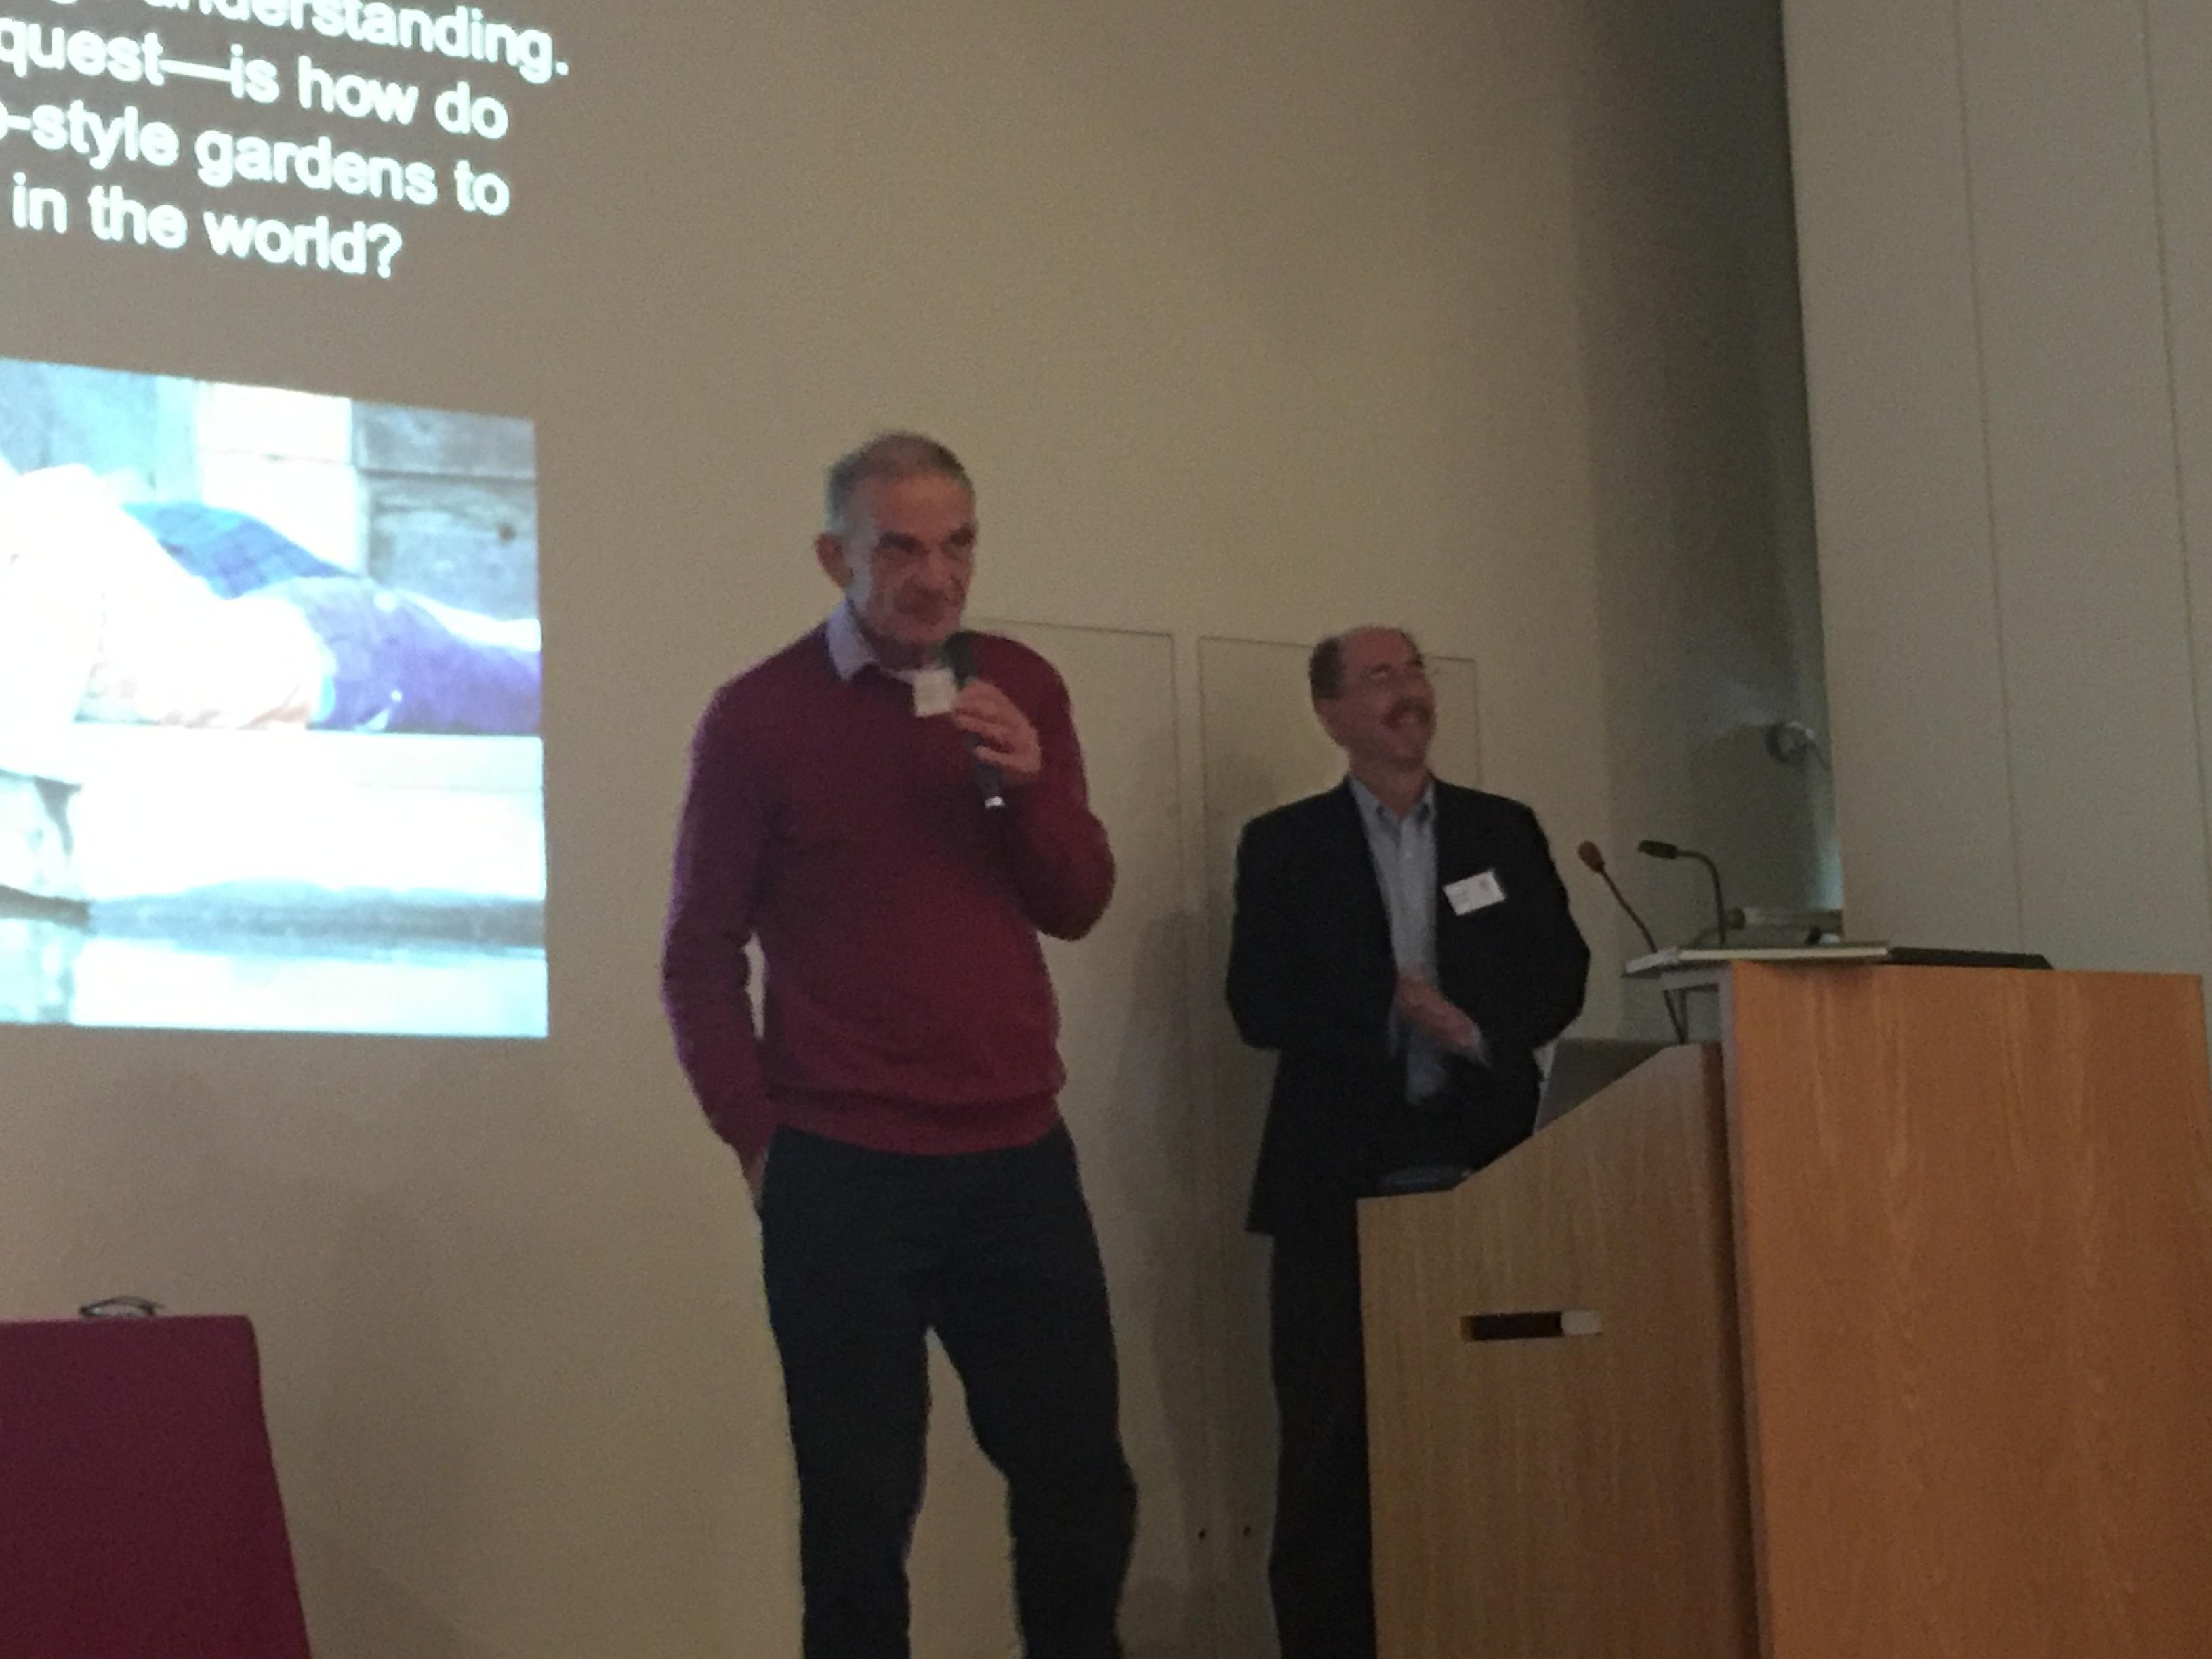 Prof. Kendall Brown and Robert Ketchall